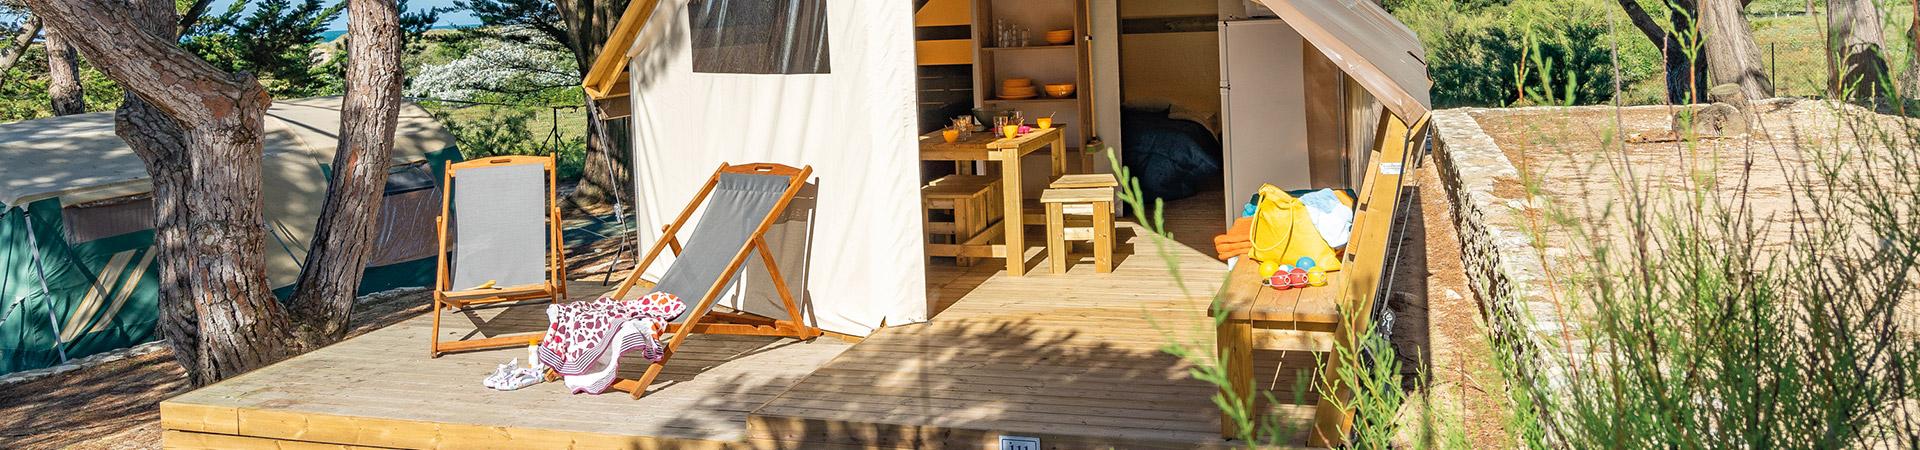 emplacement-tente-liberta-camping-merendella